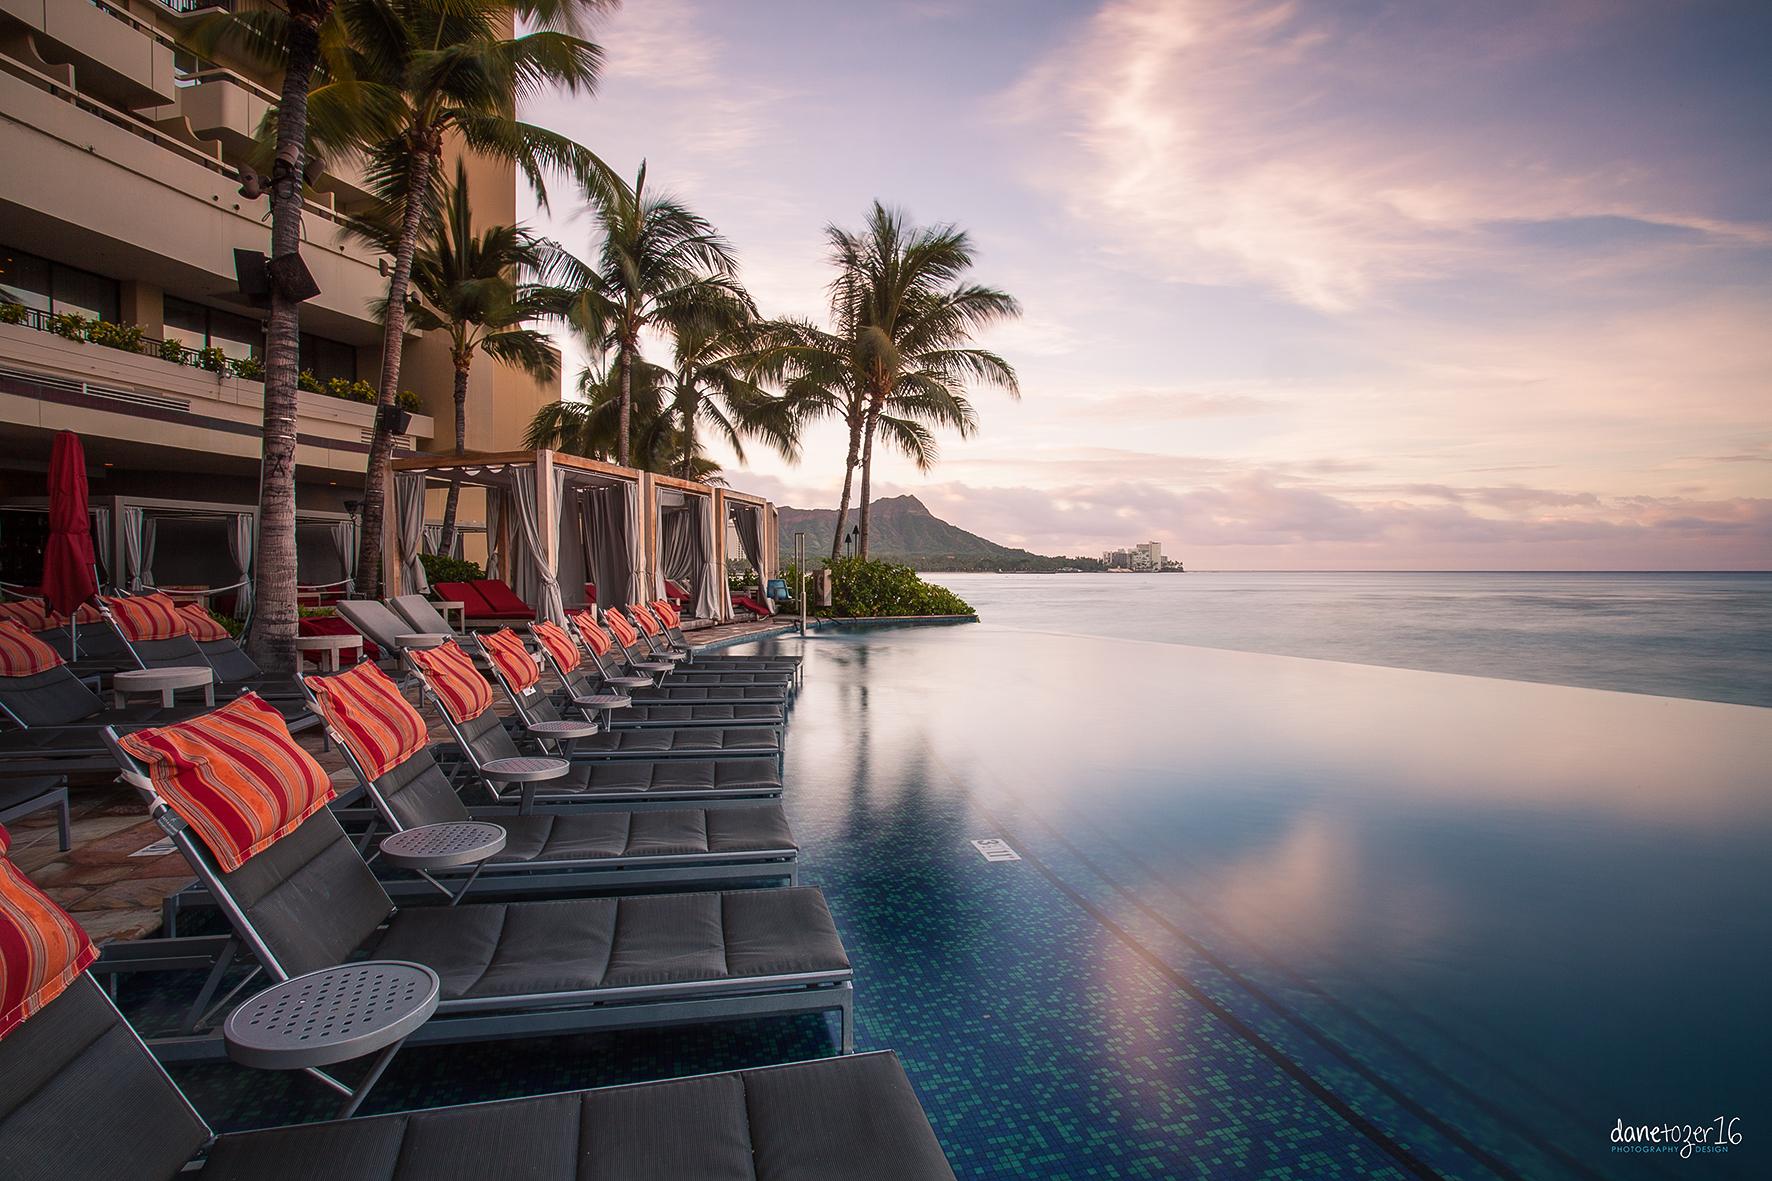 The Sheraton Infinity Pool, Waikiki Oahu